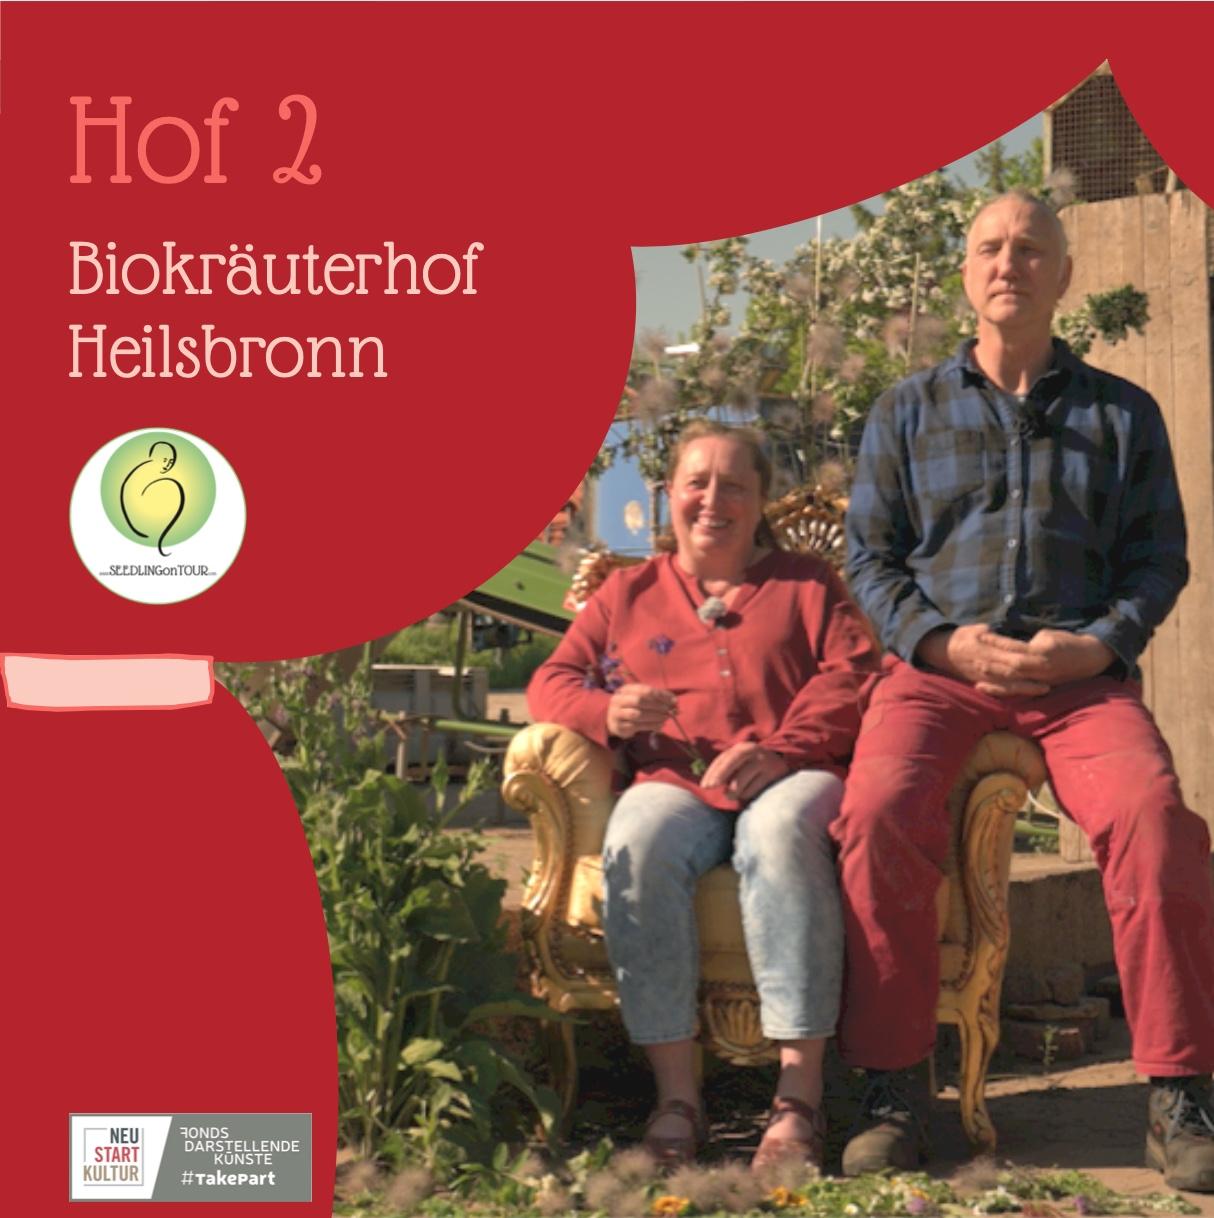 Hof. 2 Biokräuterhof